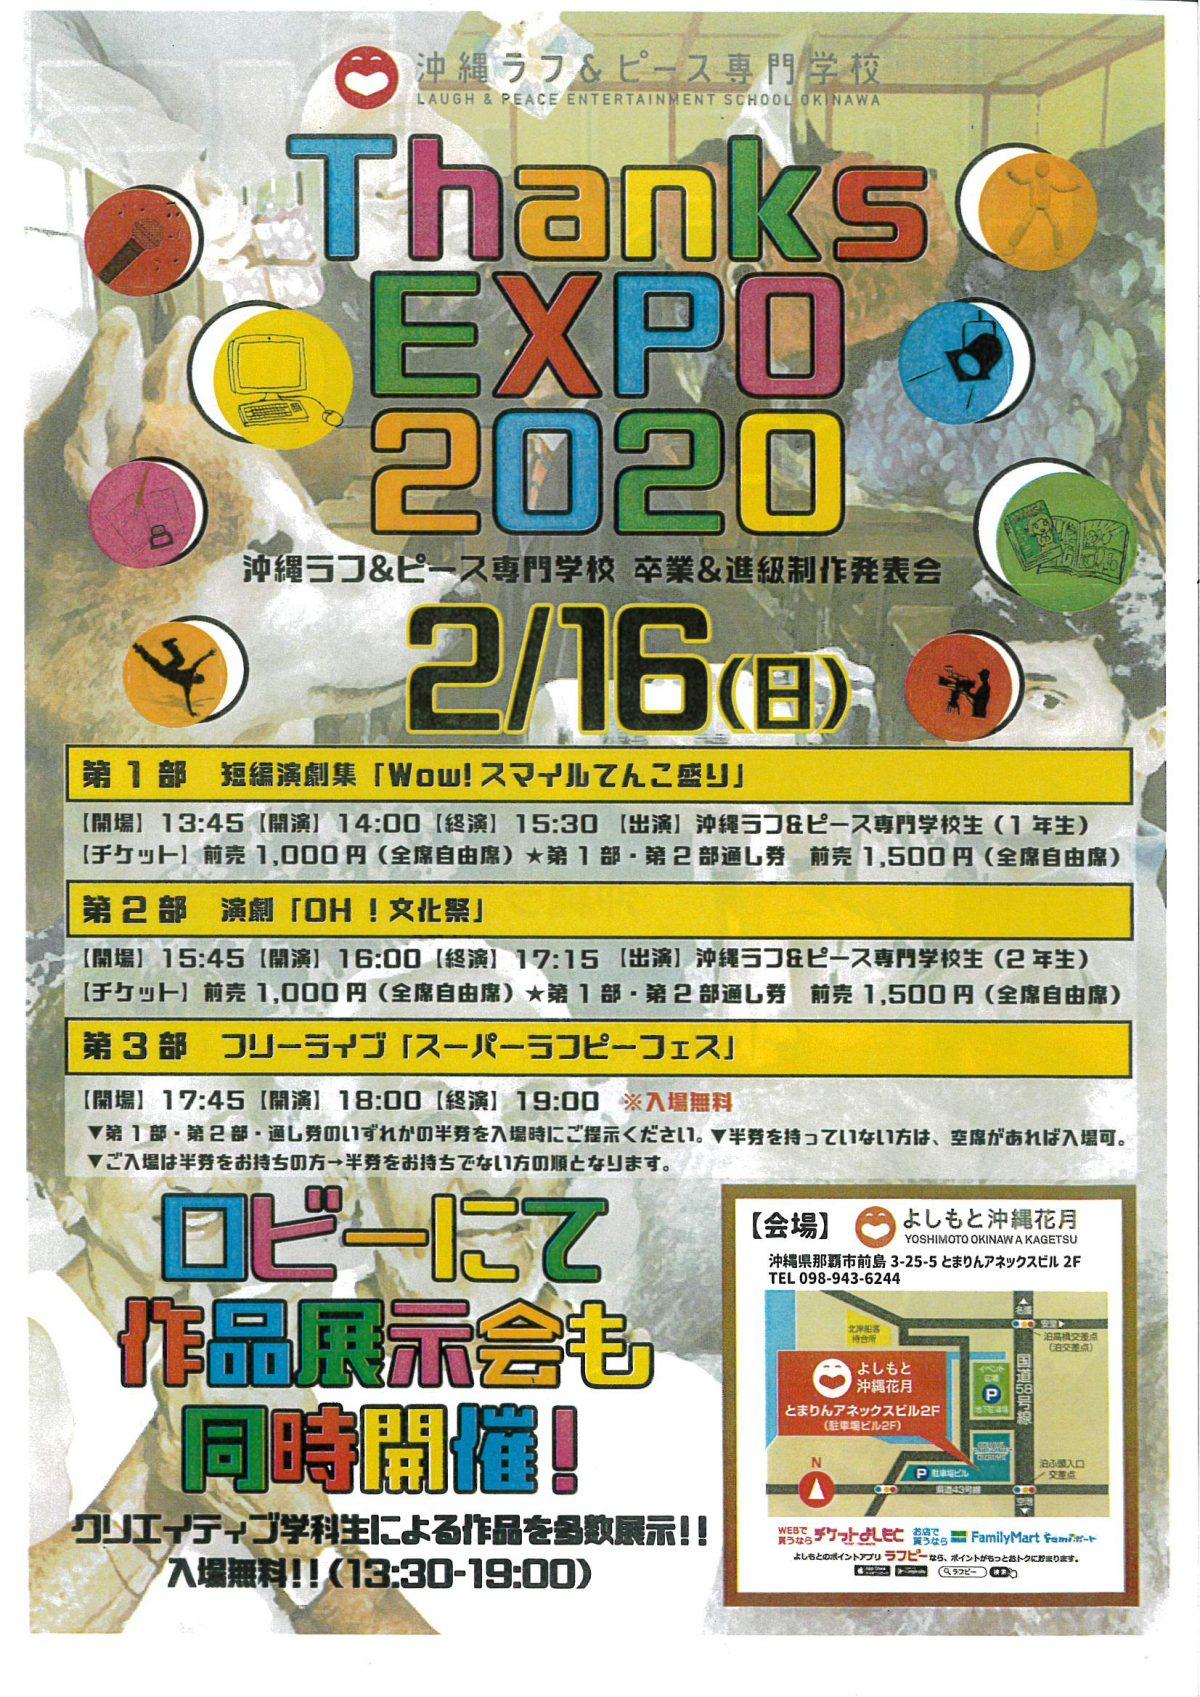 沖縄ラフ&ピース専門学校 2月16日(日)卒業&進級制作発表会「Thanks EXPO 2020」開催